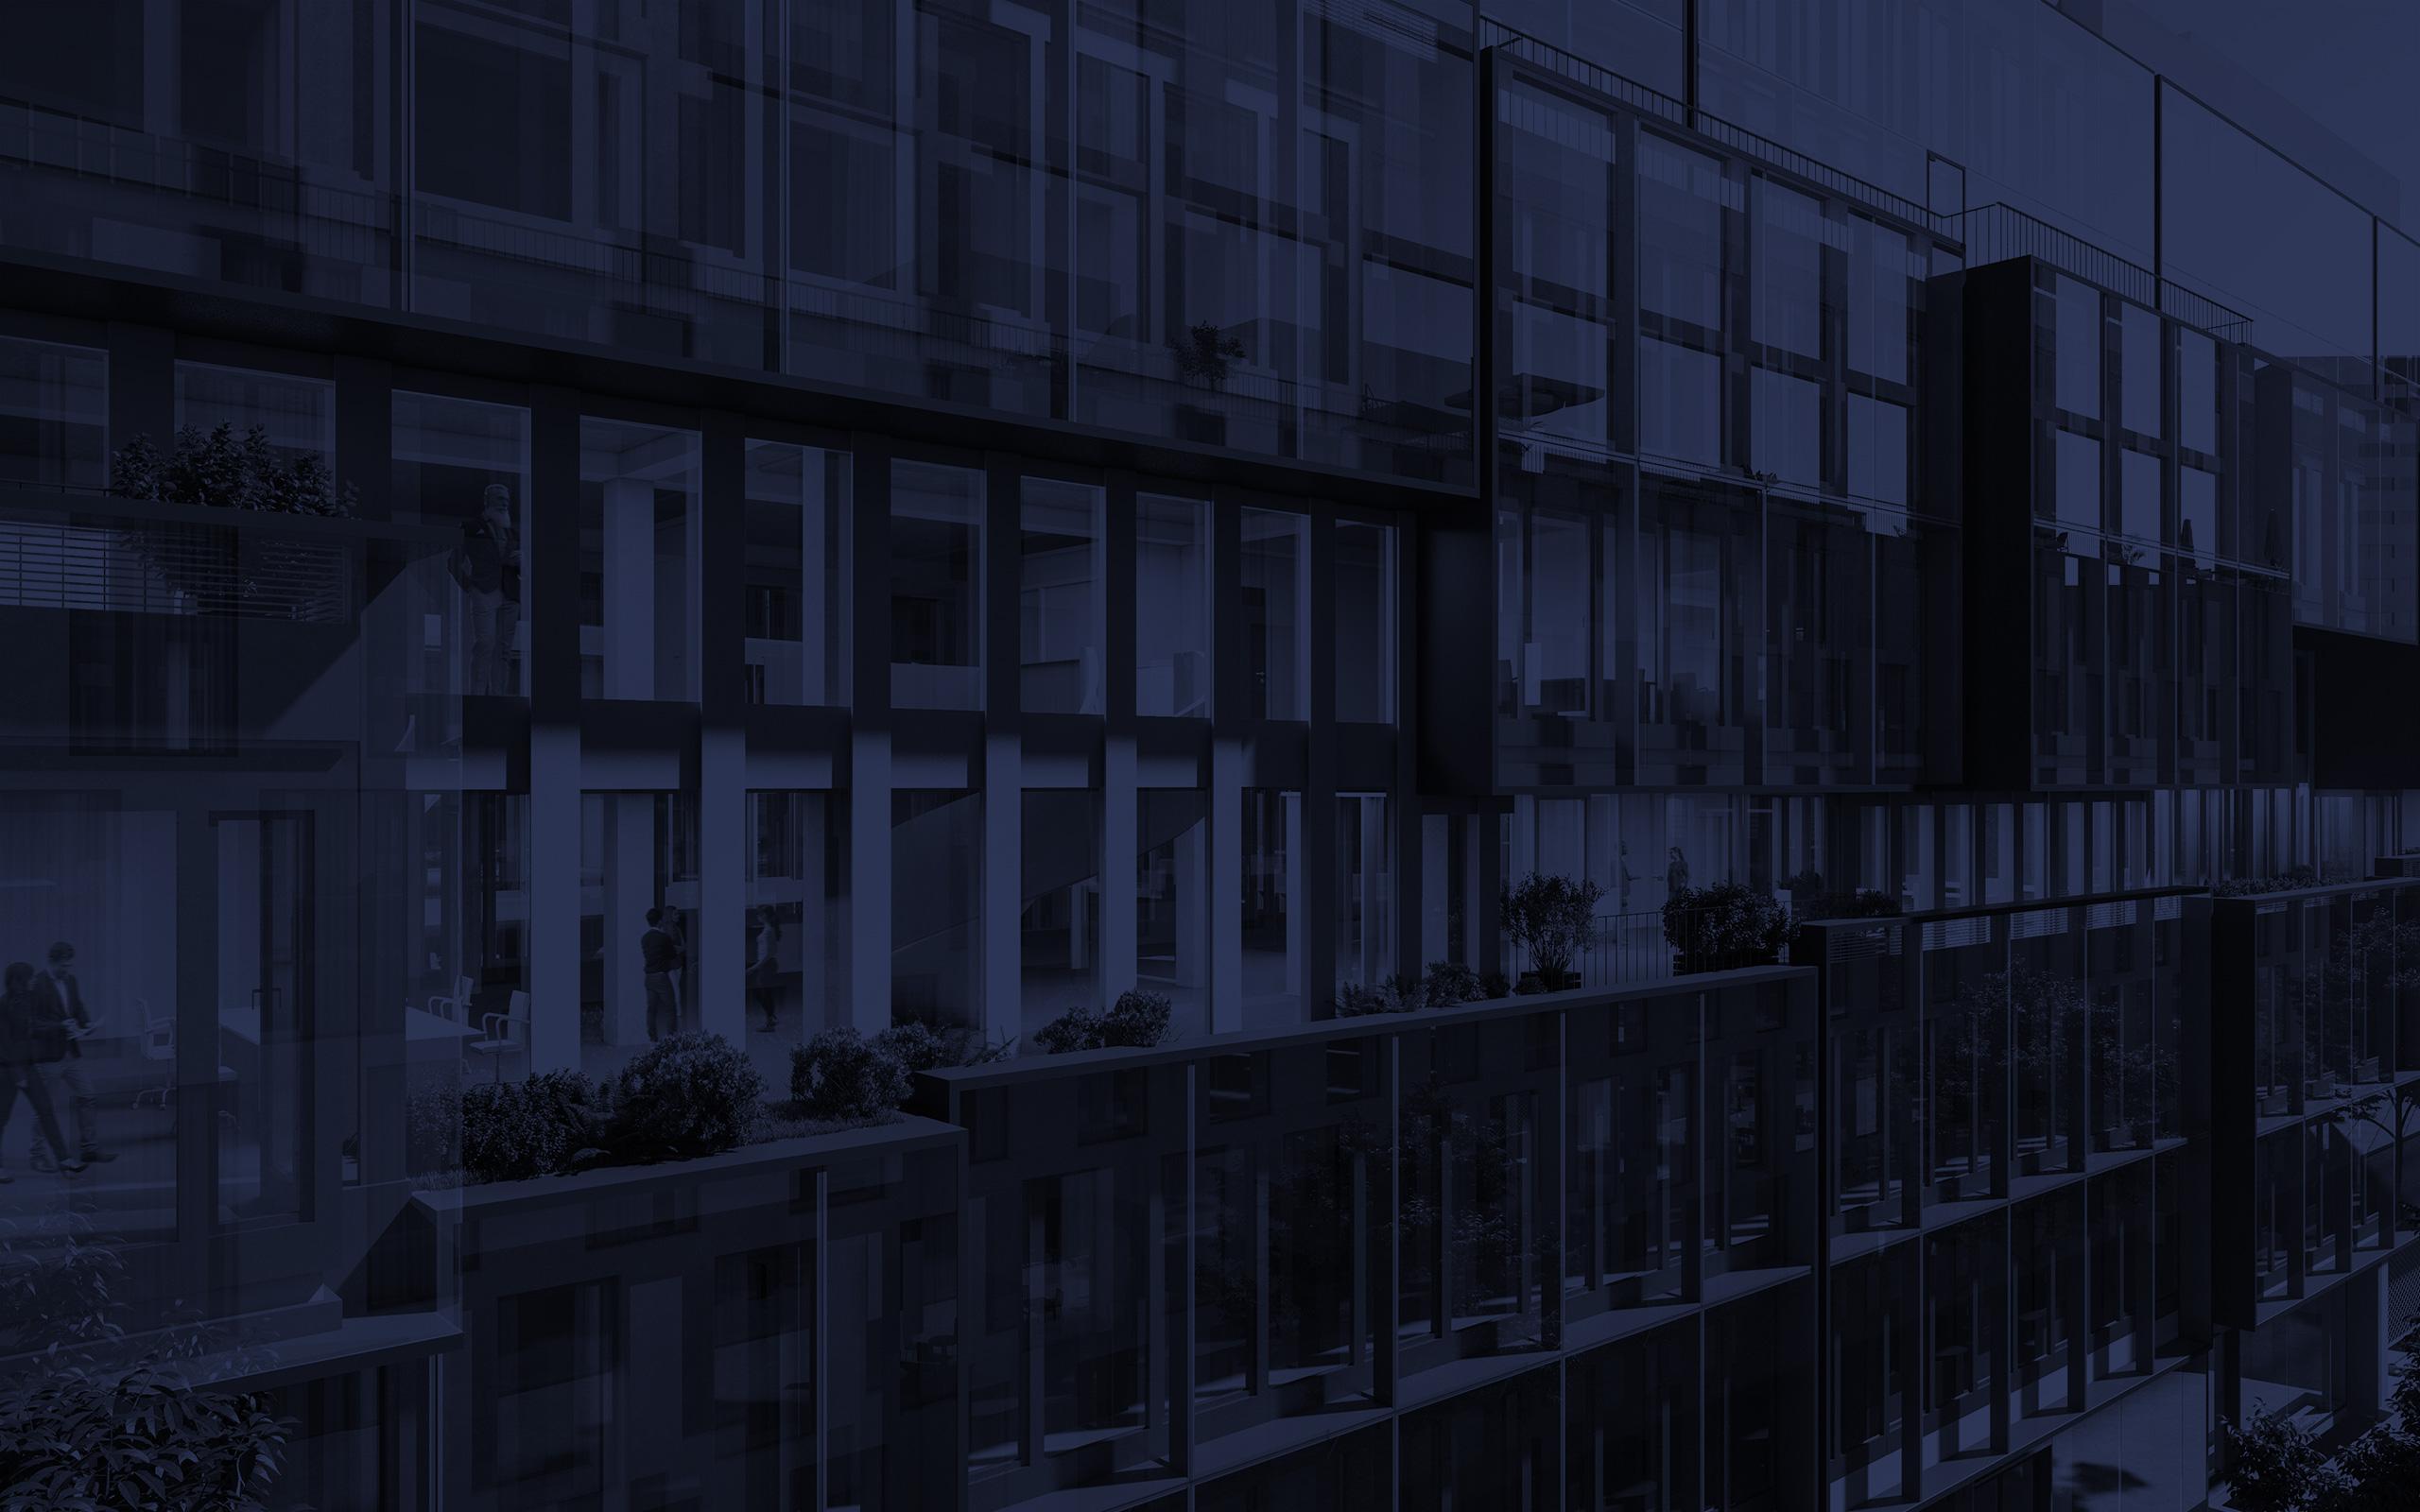 gaedeke_voltair_neu_01